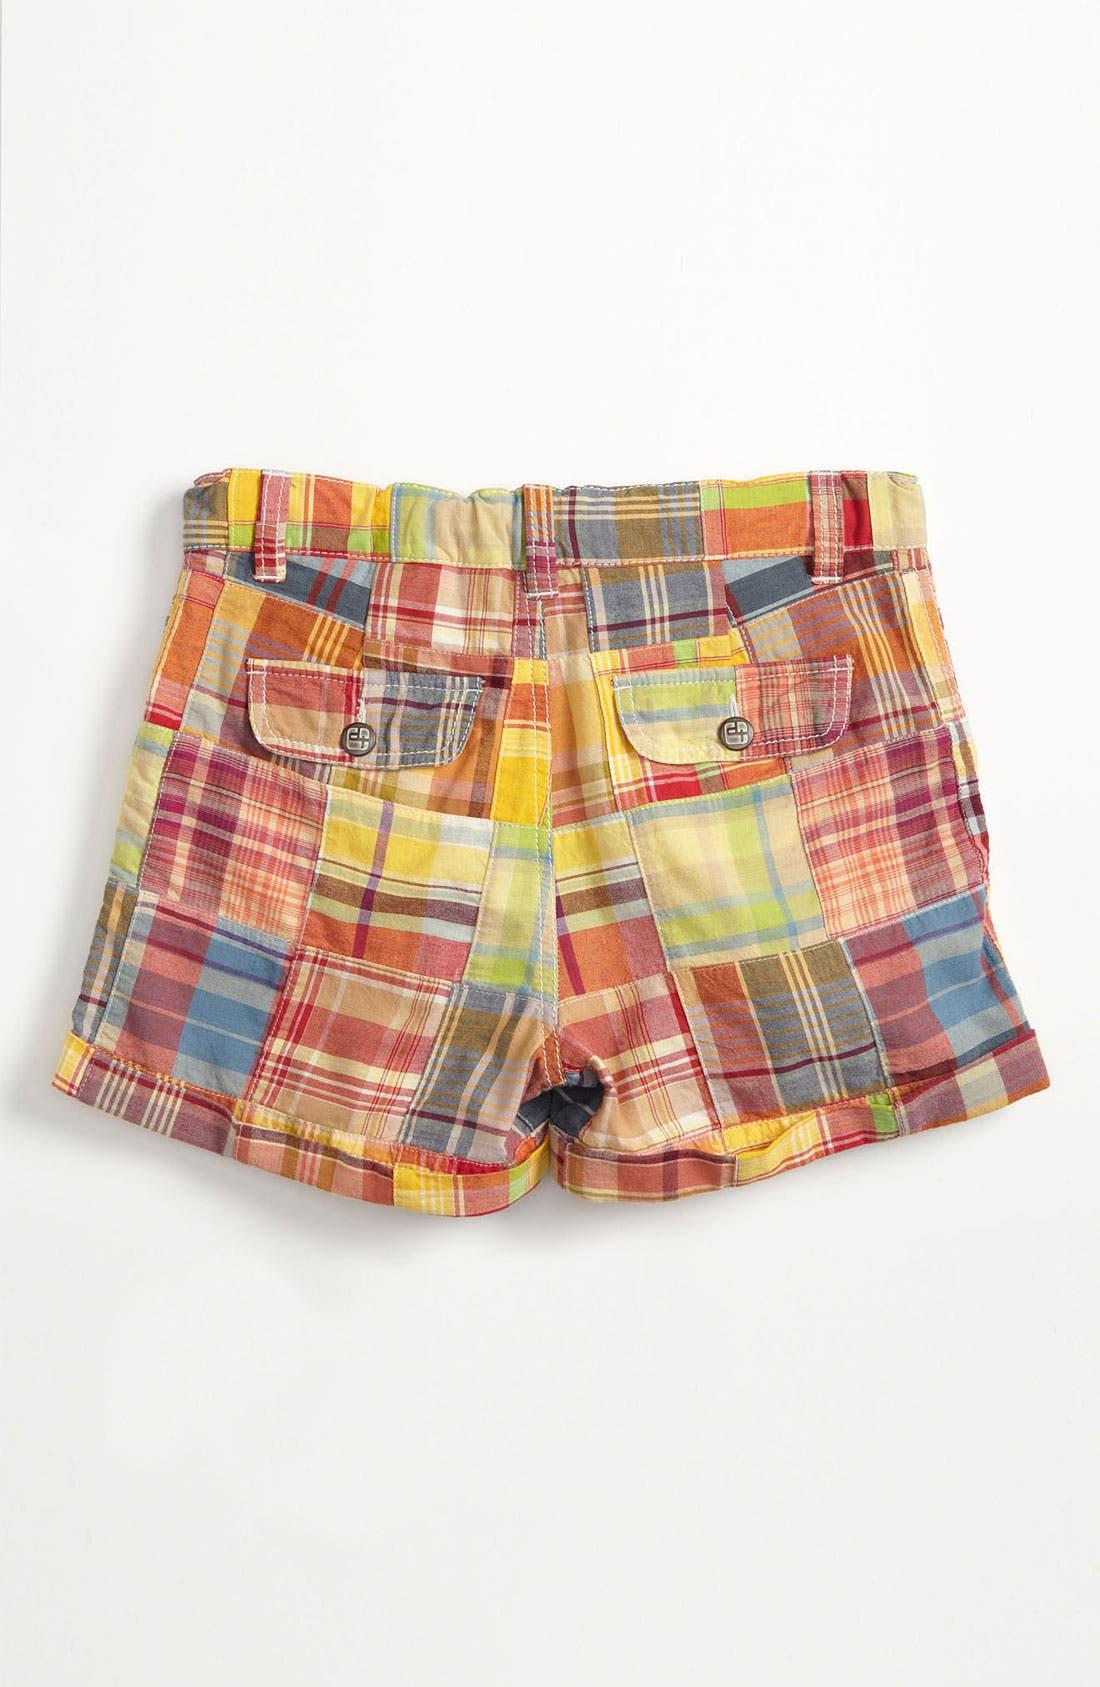 Alternate Image 1 Selected - Tucker + Tate 'Clover' Patchwork Shorts (Big Girls)